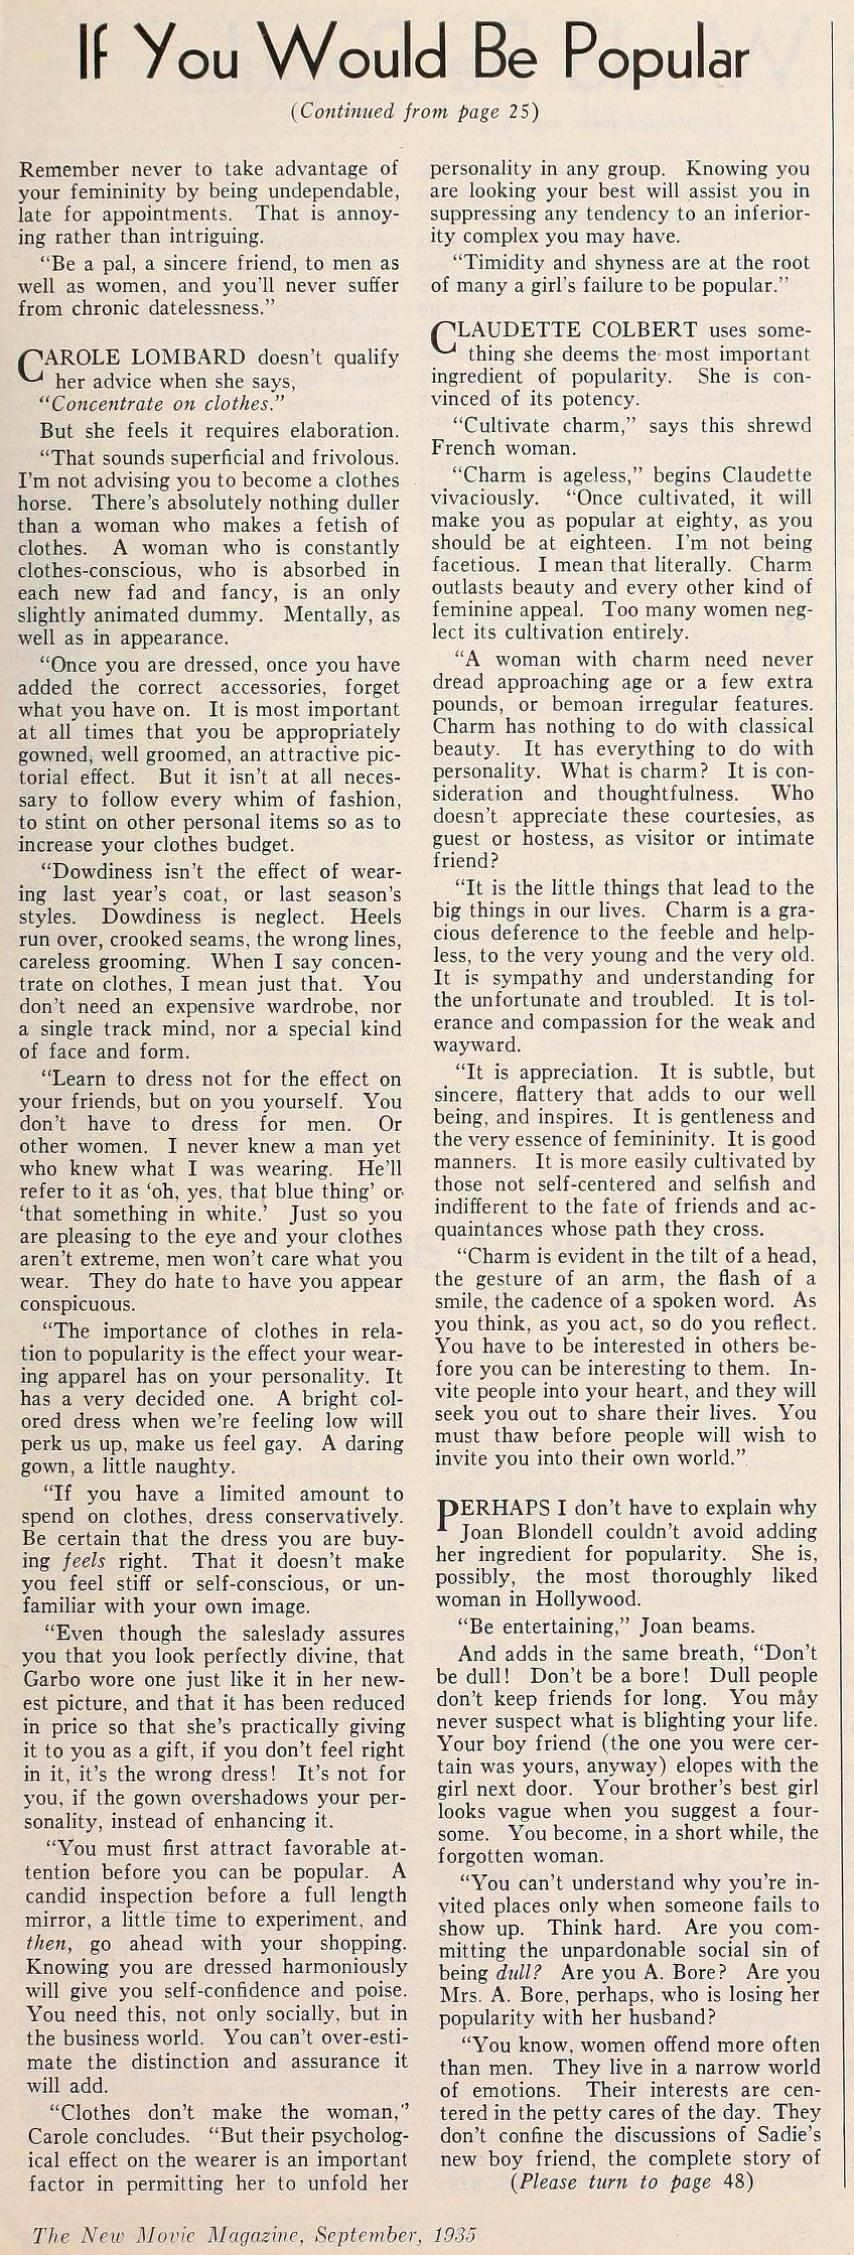 carole lombard the new movie magazine september 1935ba